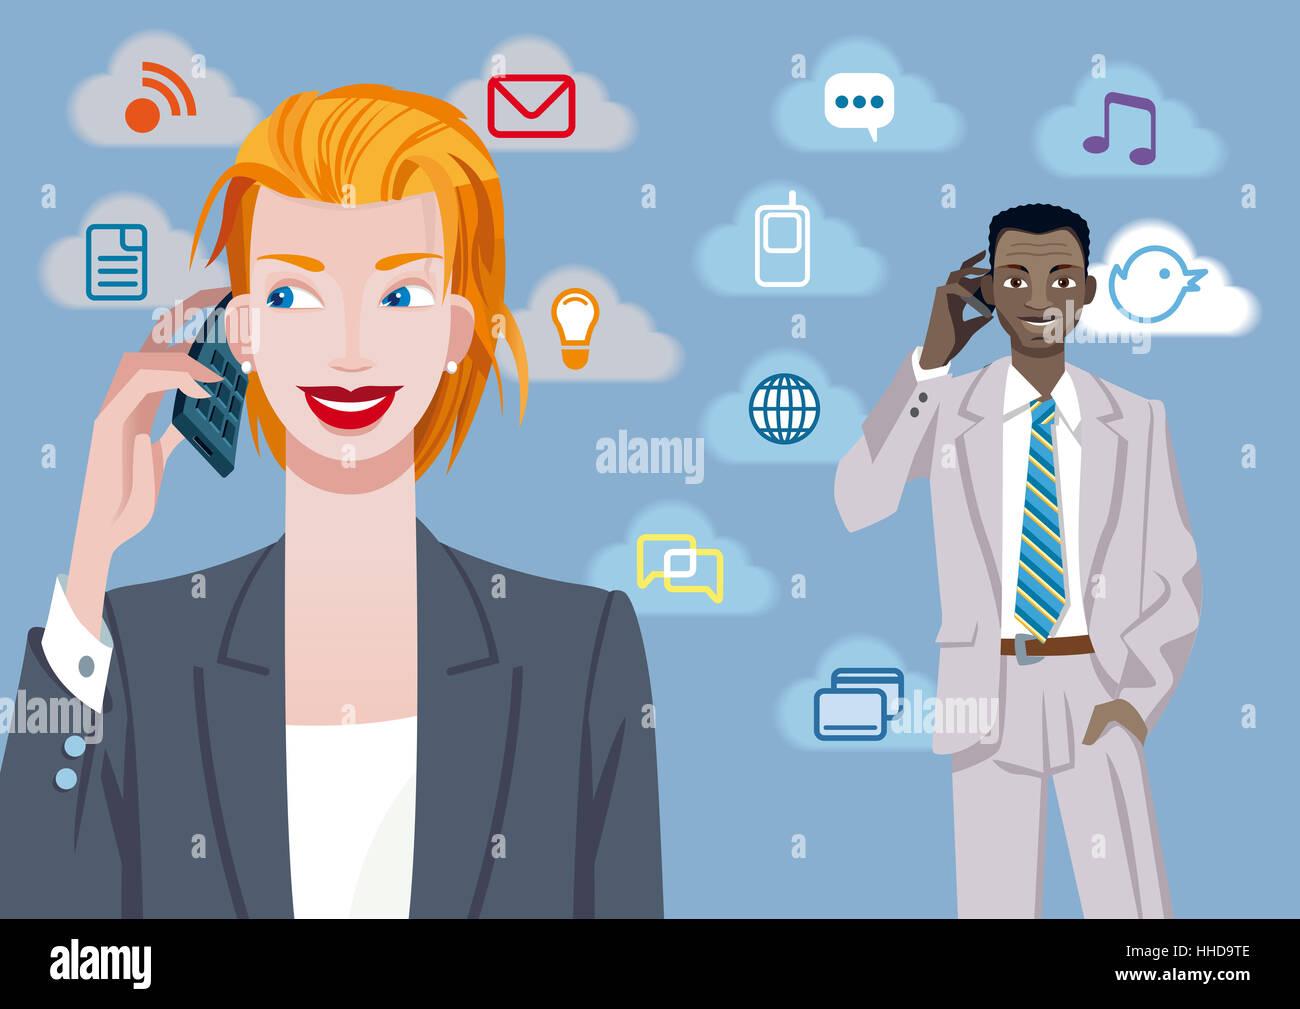 woman, telephone, phone, cellphone, mobile, mobile phone, communication, black - Stock Image